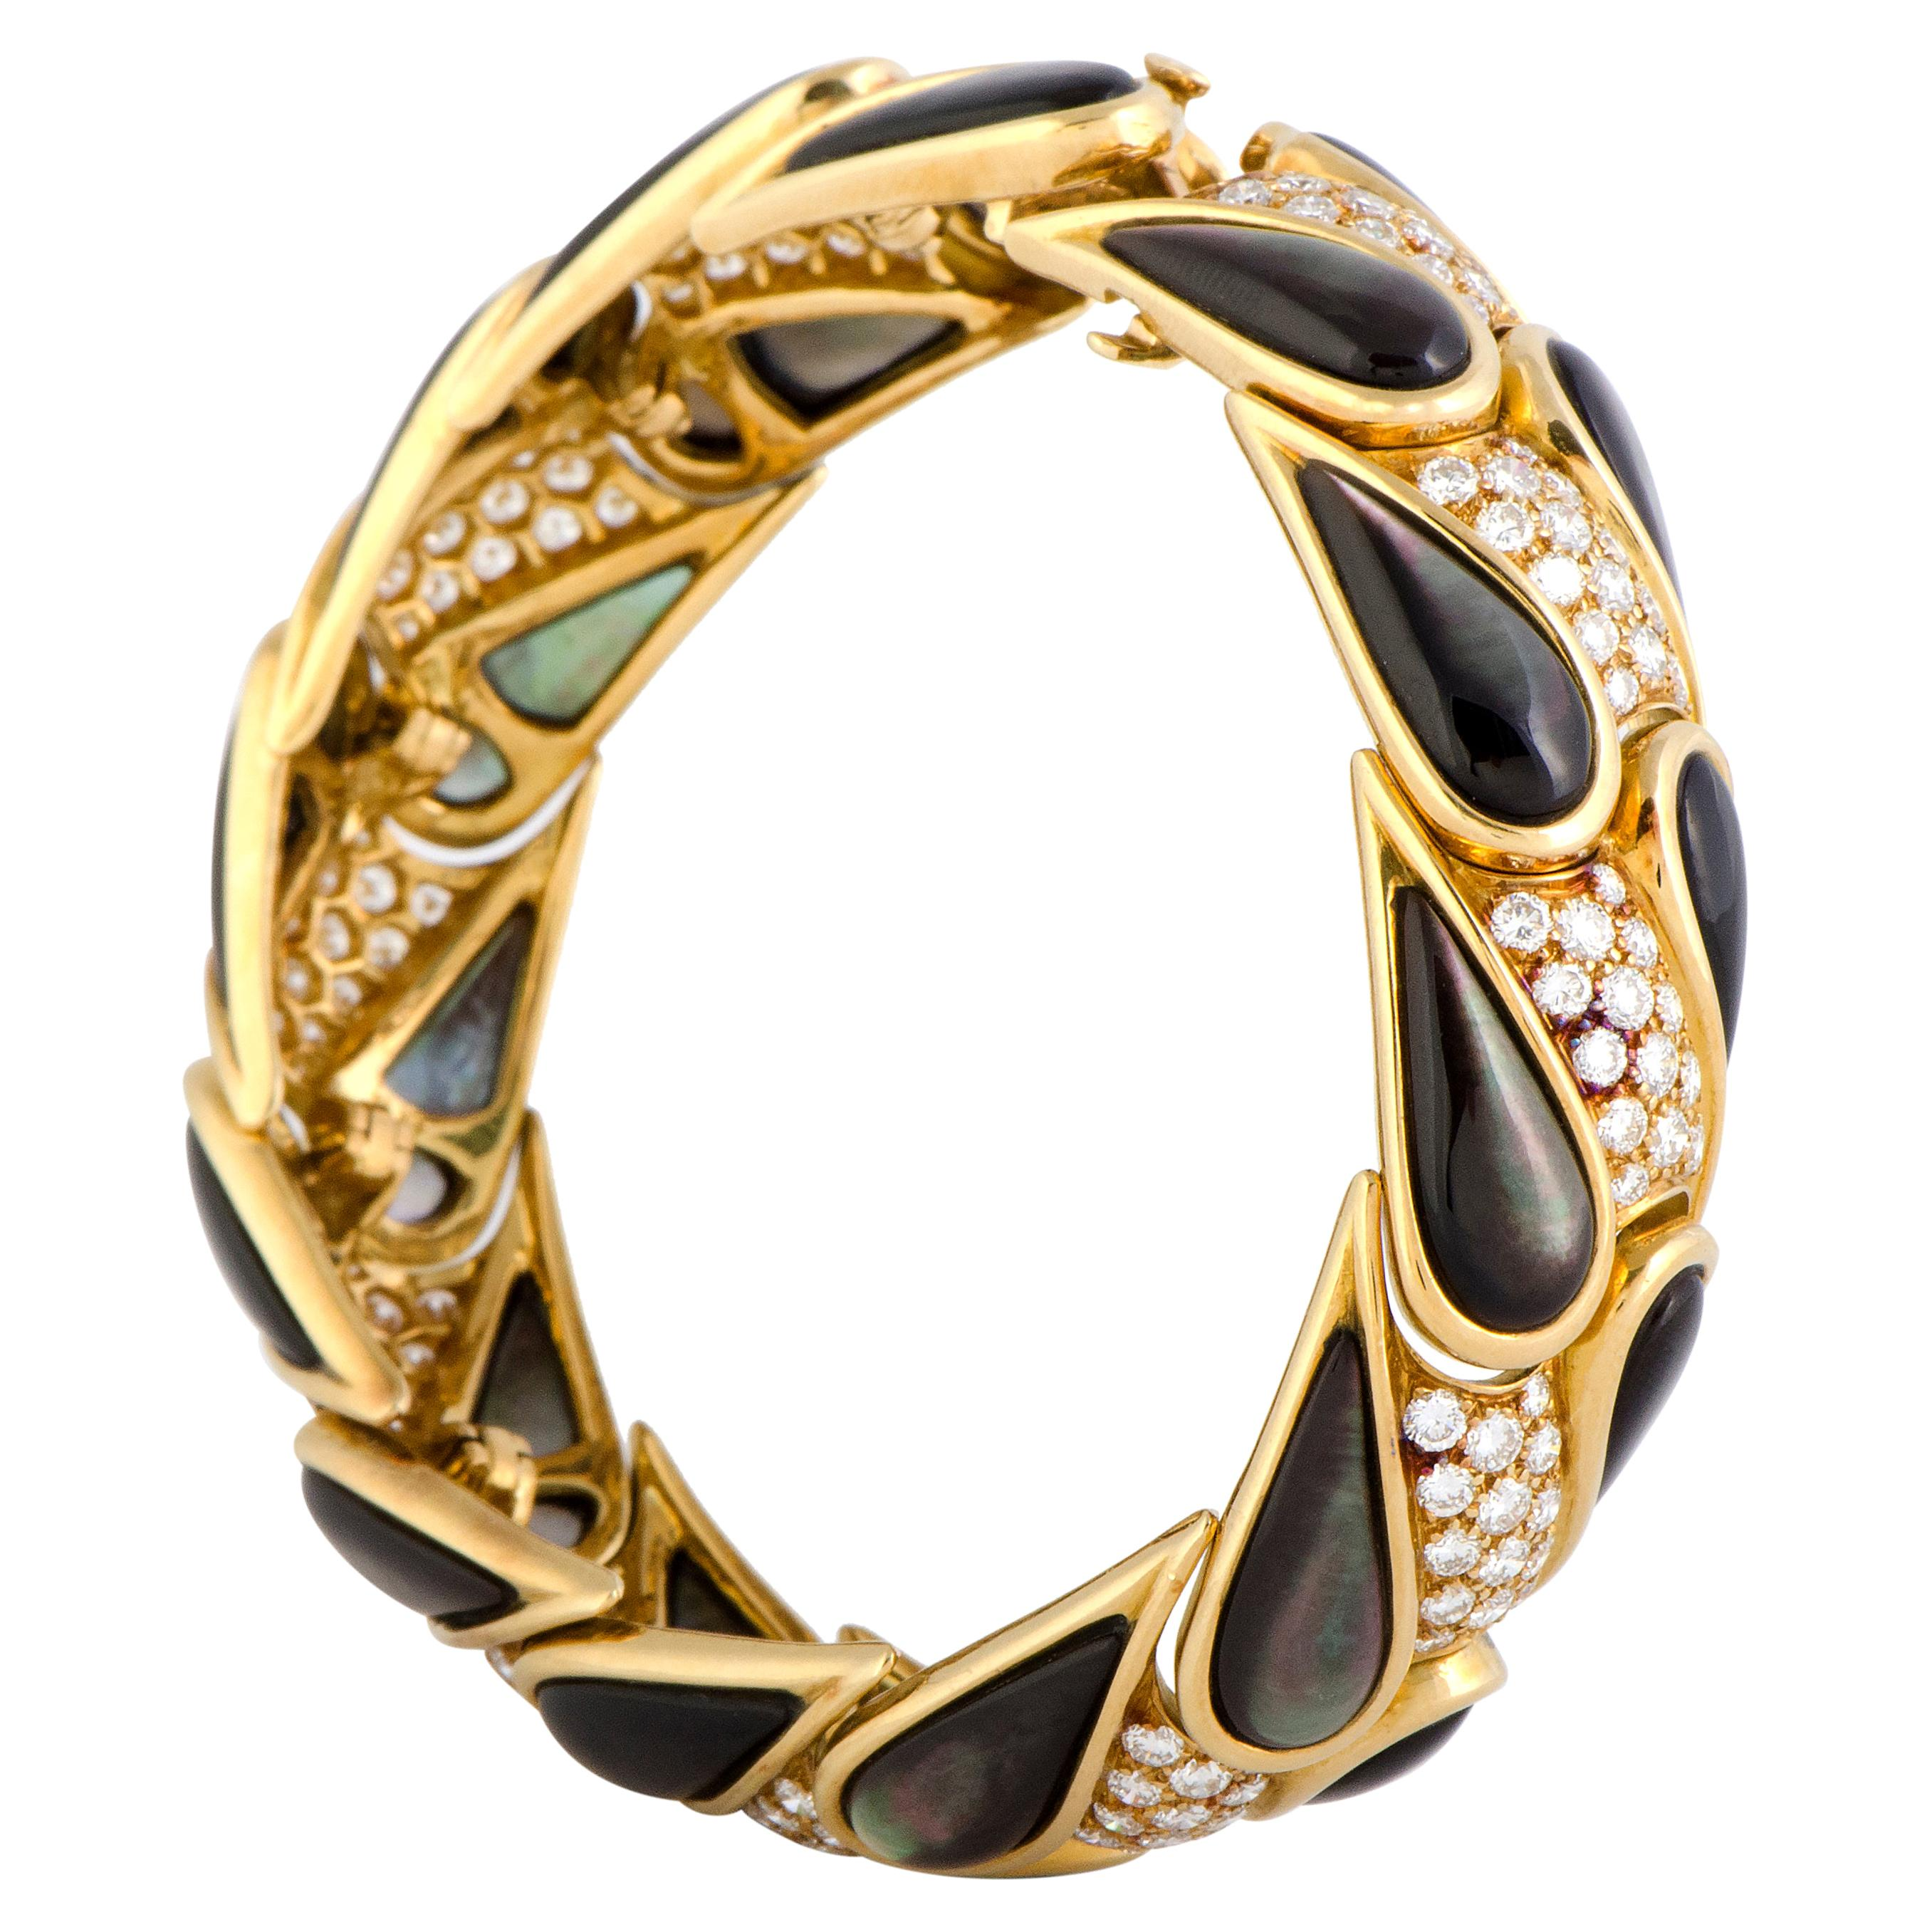 Mauboussin 4.25 Carat Diamond and Black Mother of Pearl 18 Karat Gold Bracelet